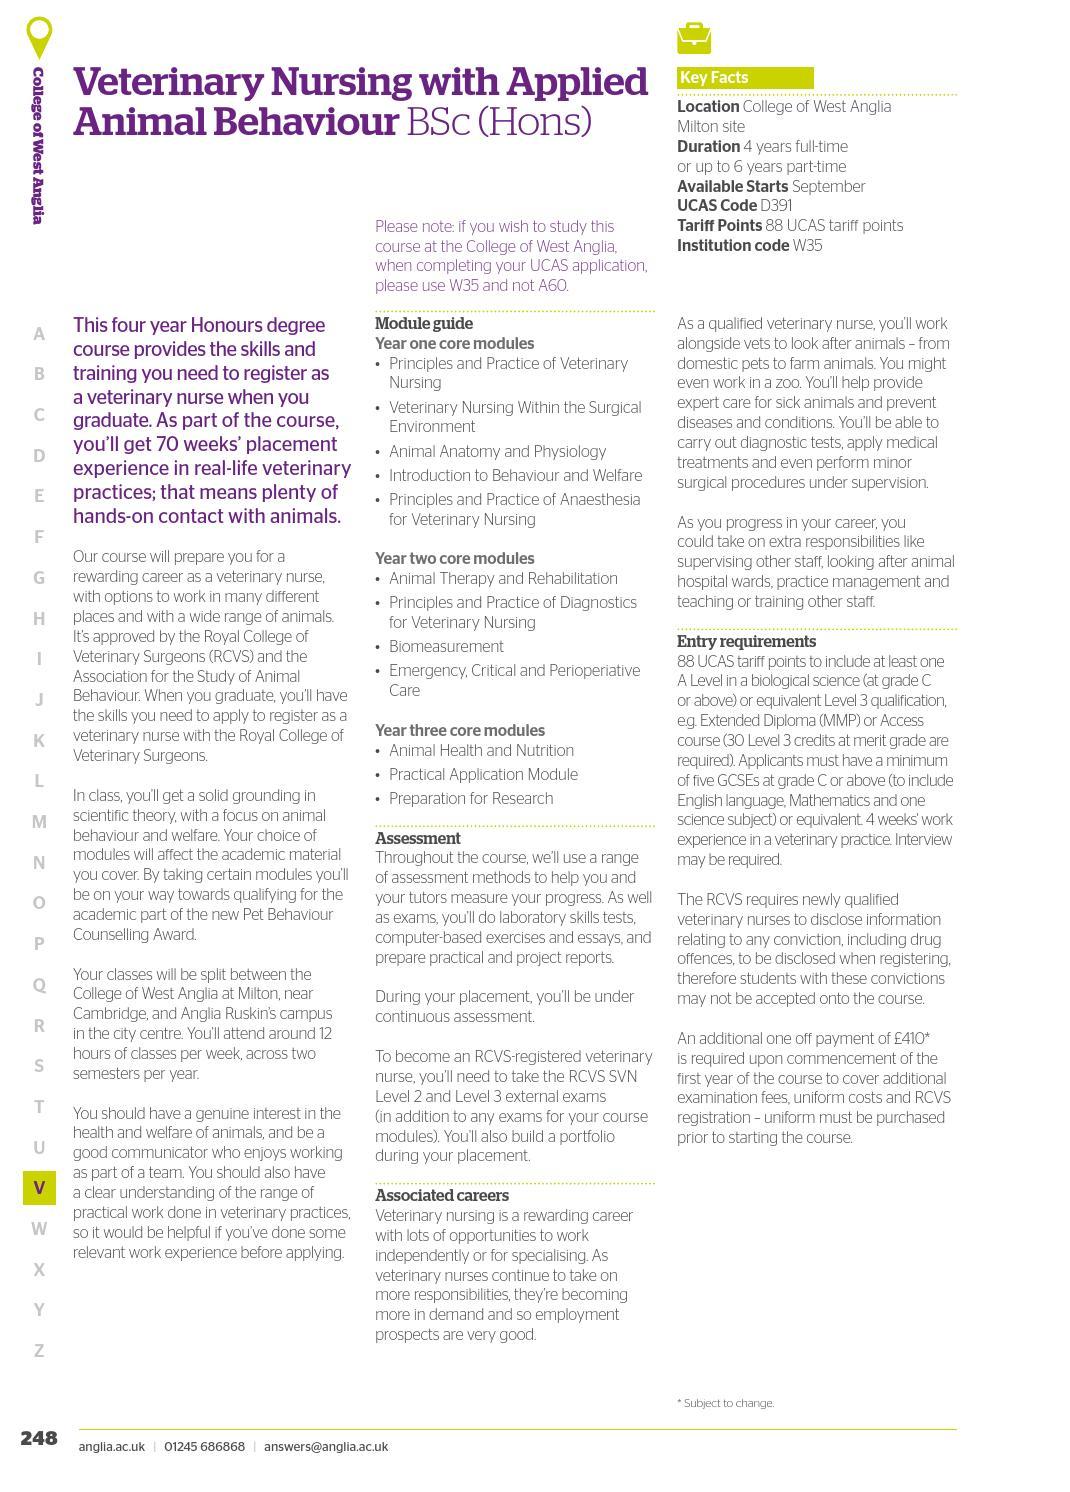 Anglia Ruskin University UG Prospectus 2017-18 by angliaruskin - issuu